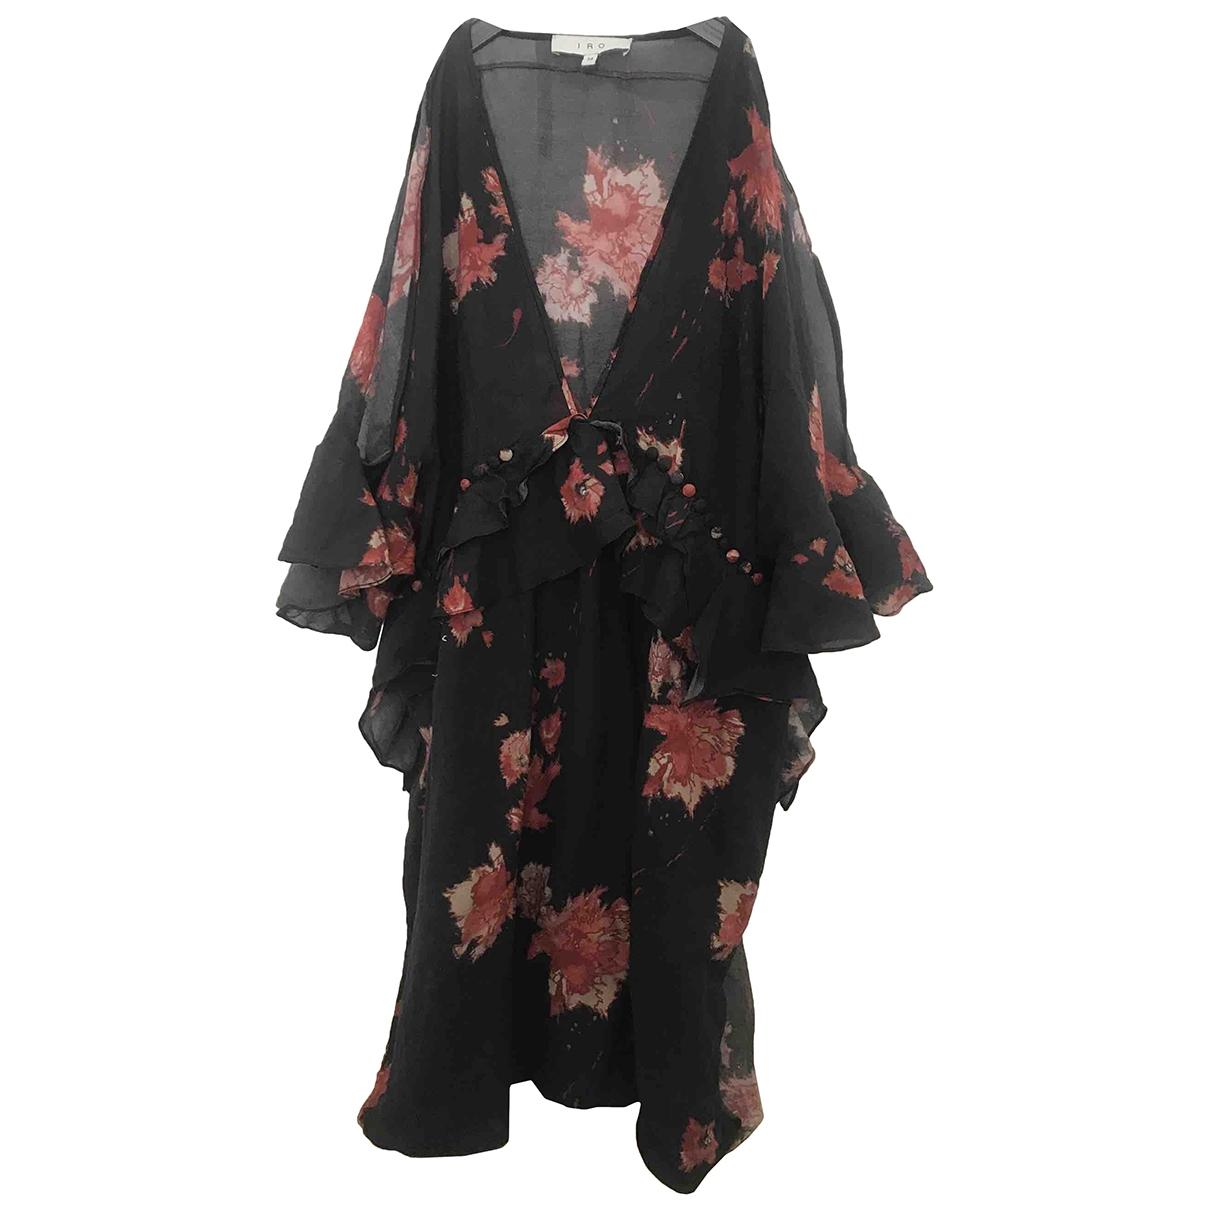 Iro \N Black Cotton dress for Women 34 FR